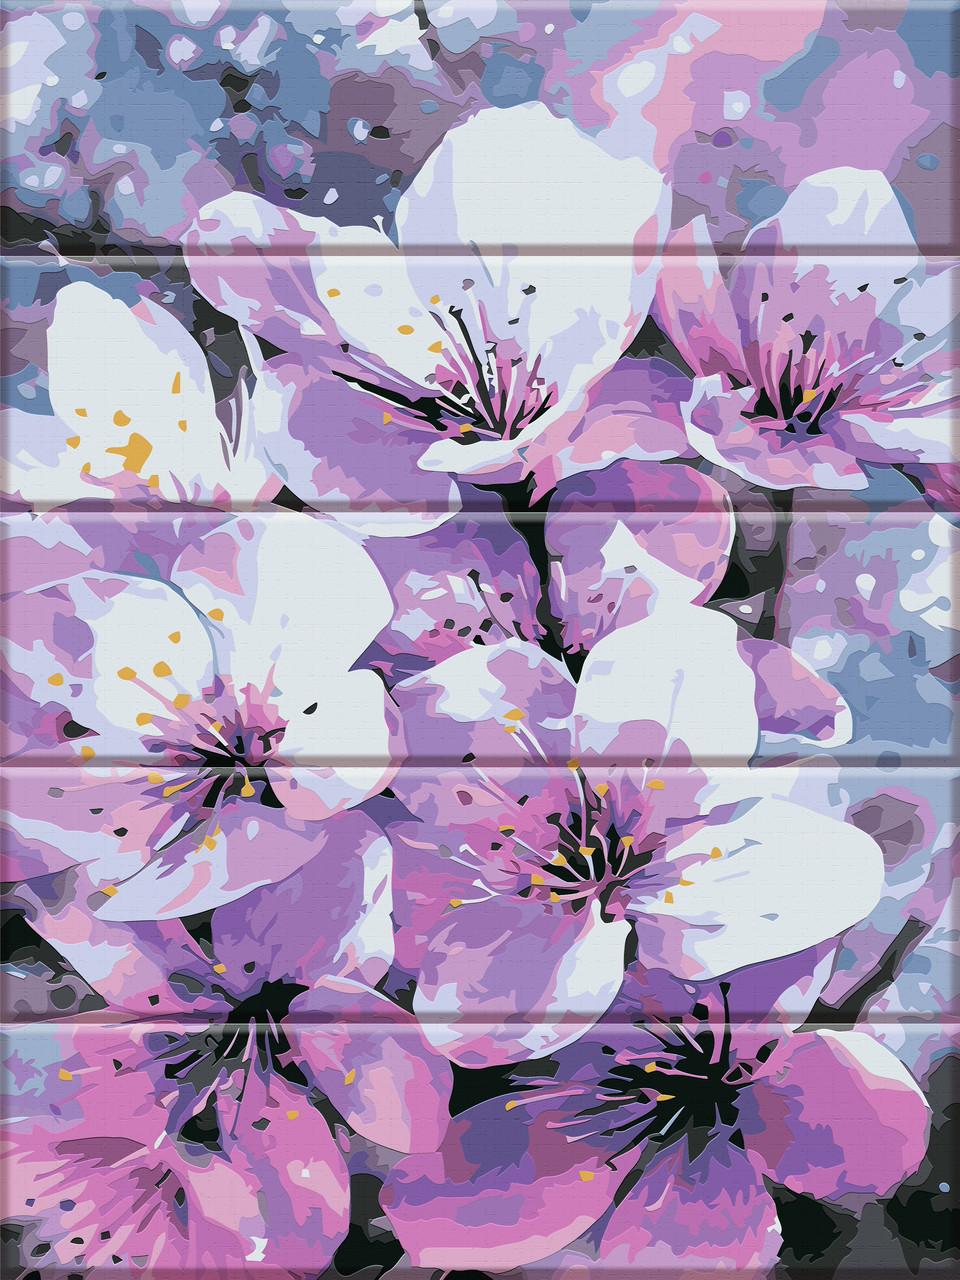 Живопись по номерам на дереве Первоцвет ArtStory ASW006 30 х 40 см